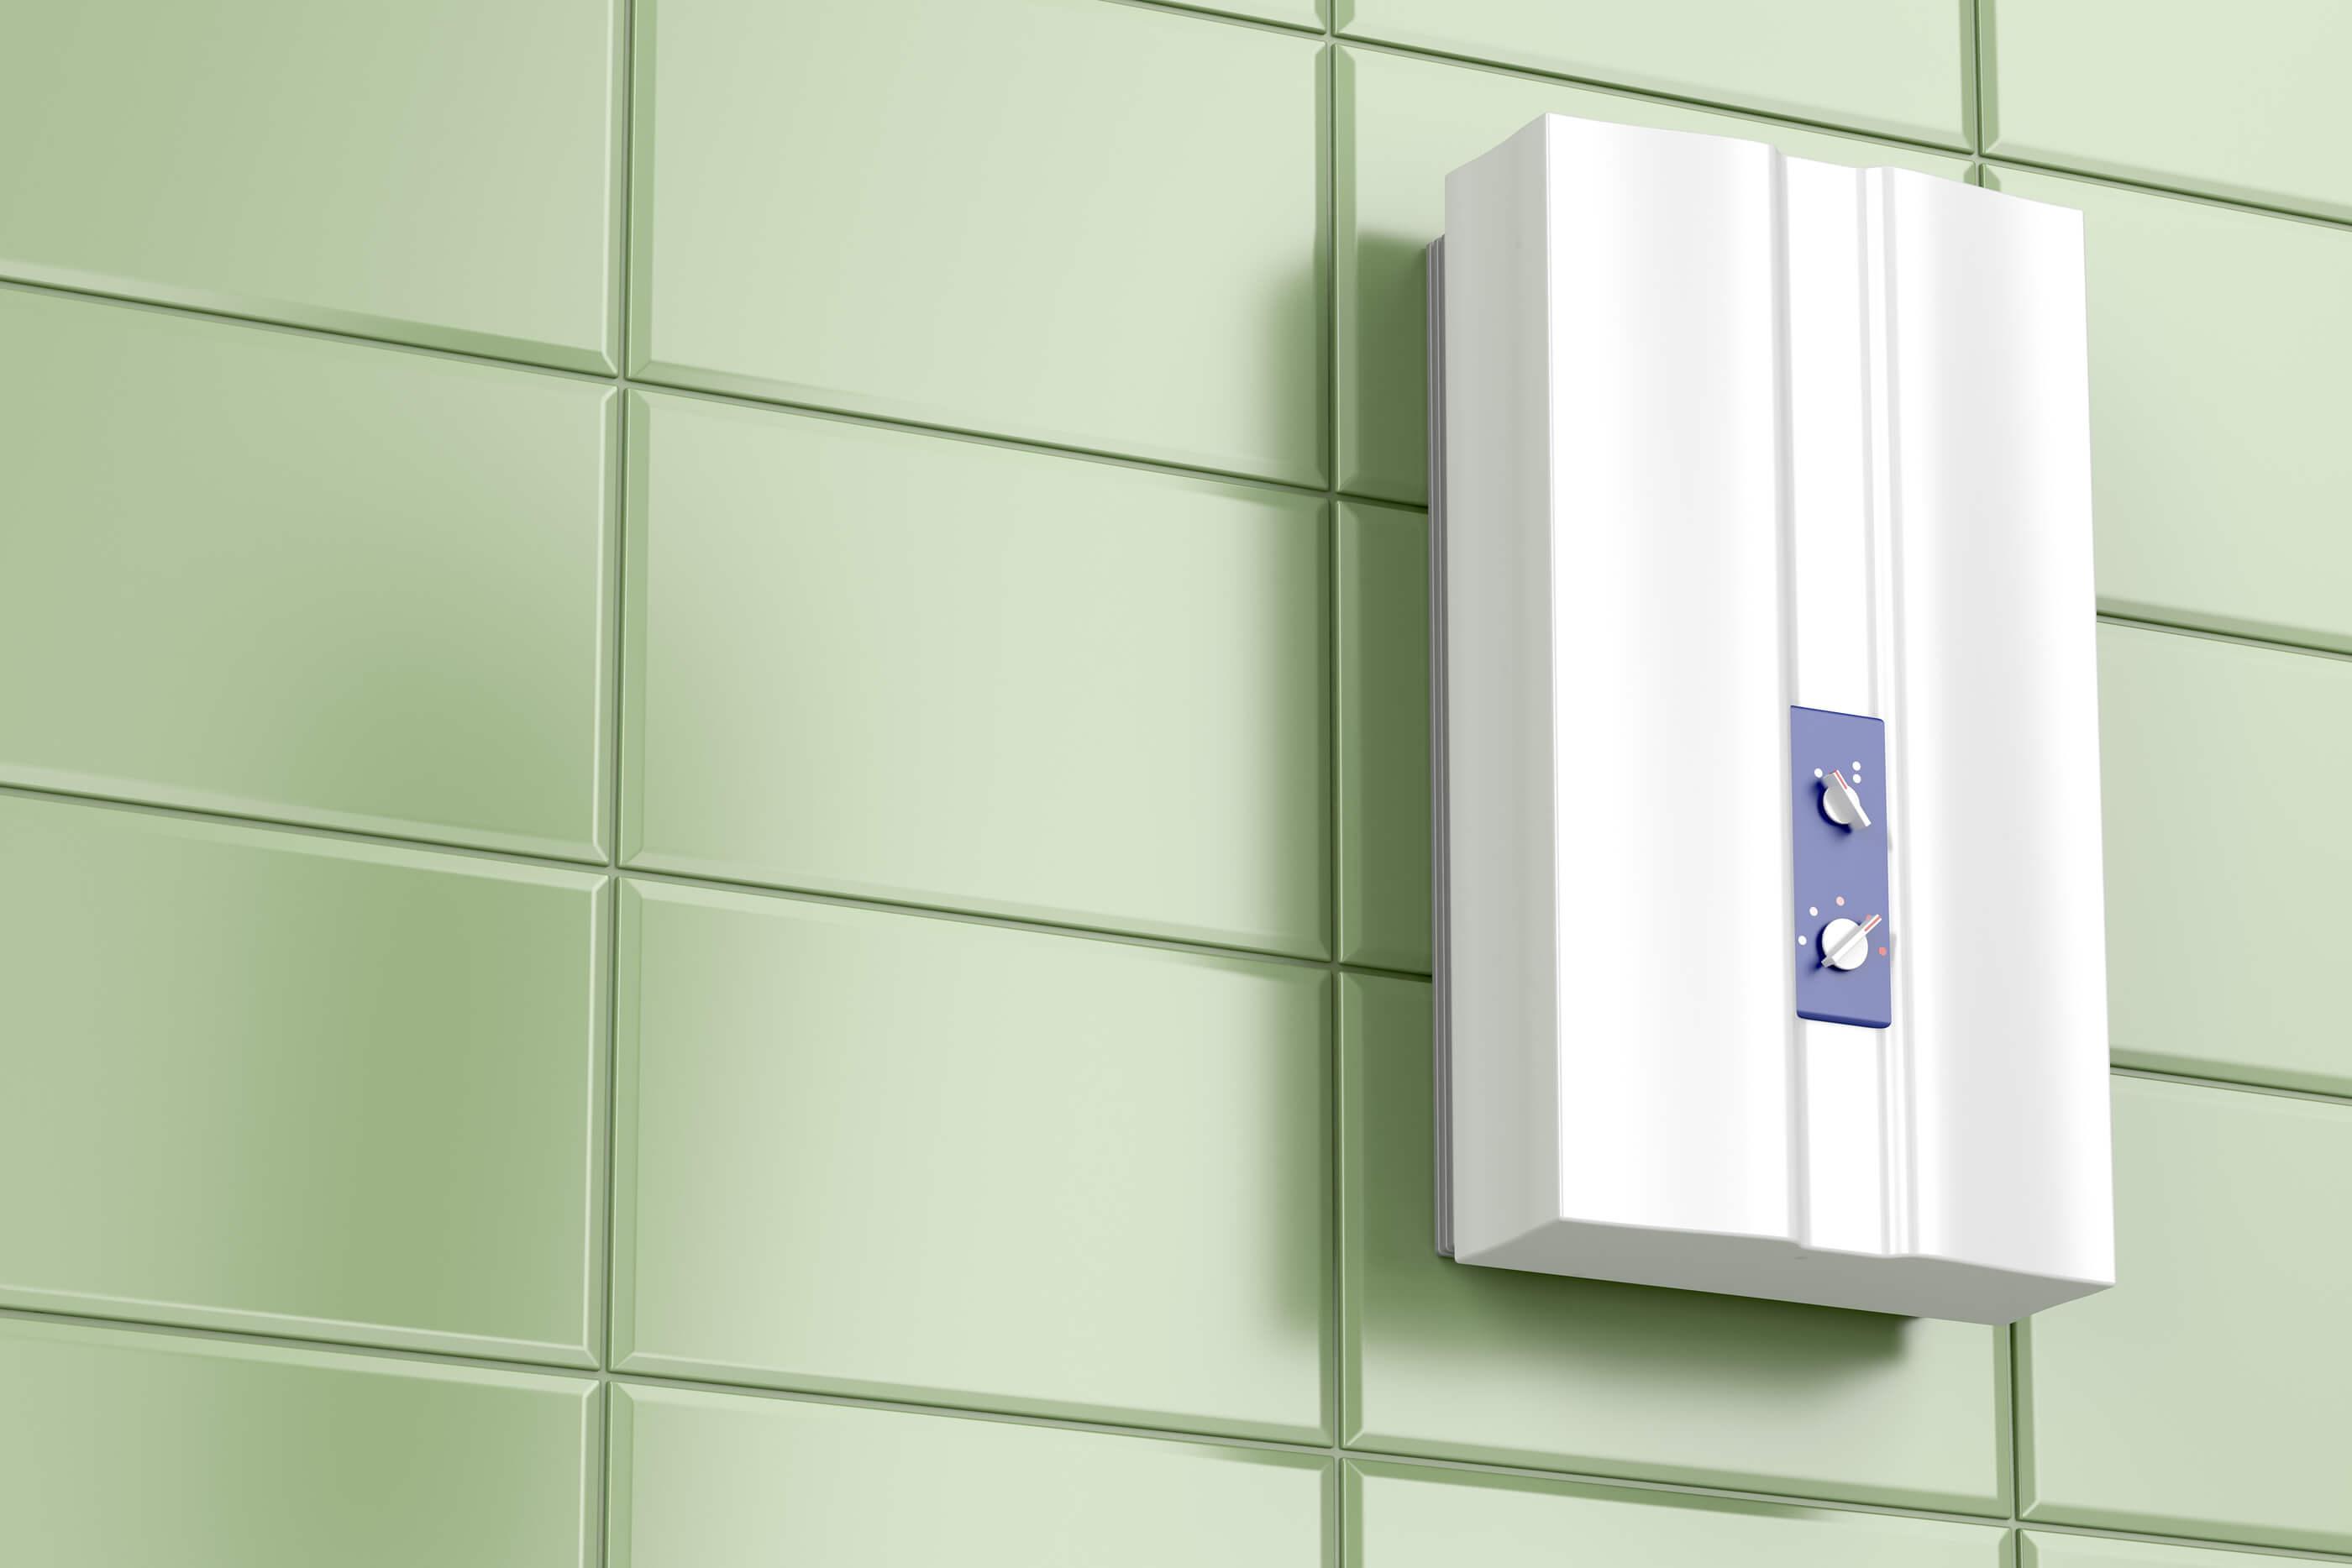 water heater repair in Sacramento, CA by Crystal Blue